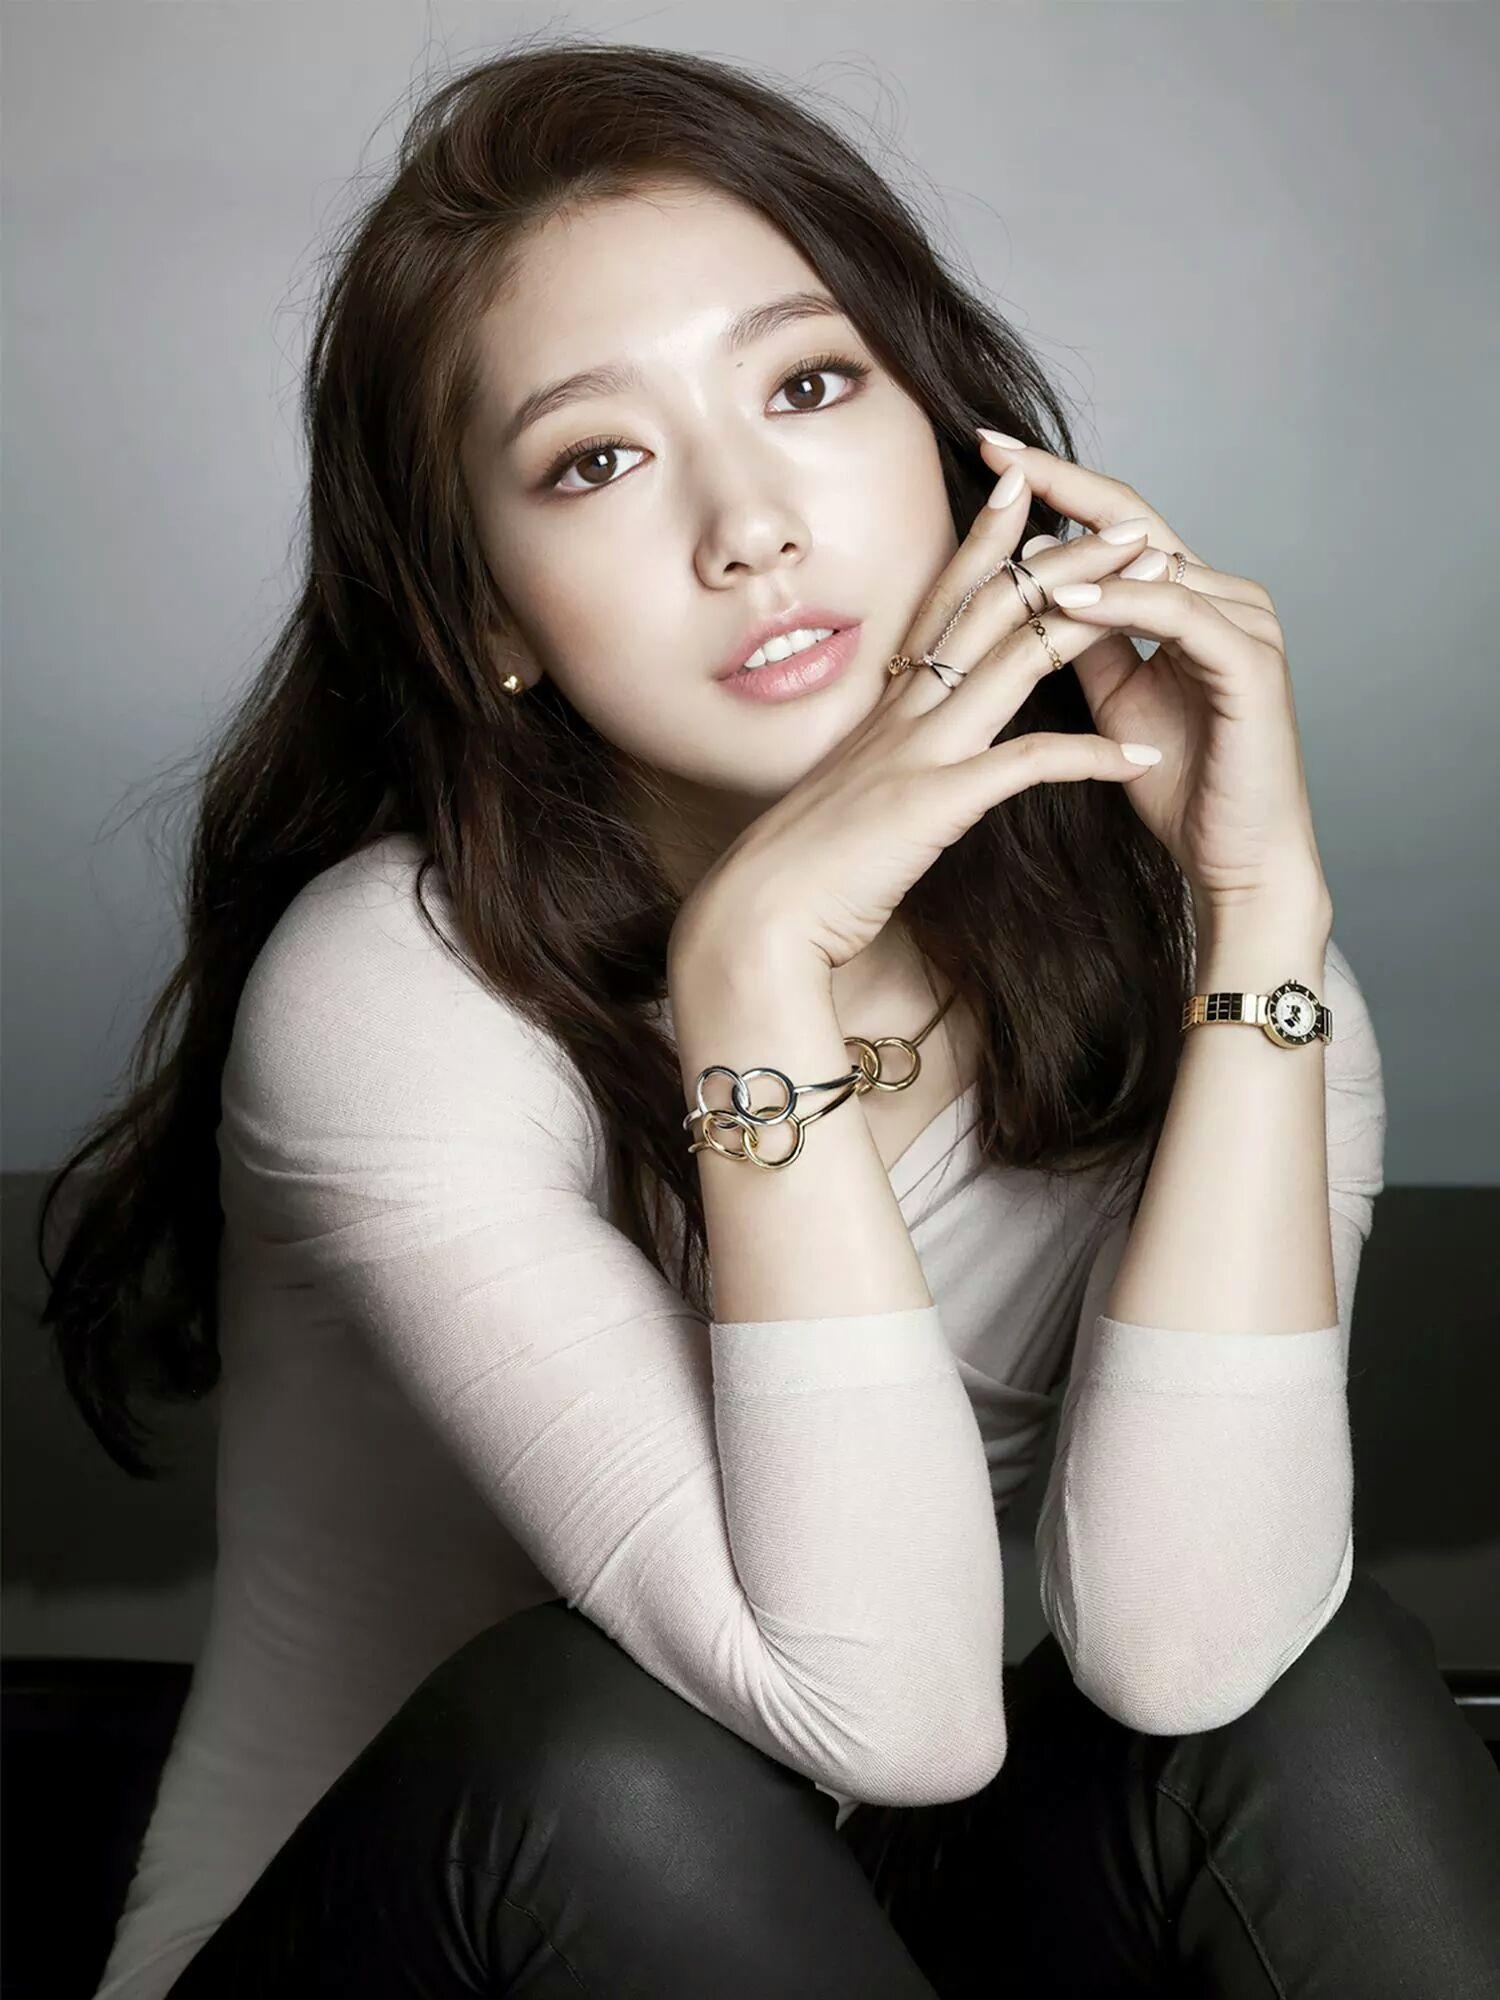 What Happened When Park Shin Hye Met Gong Yoo